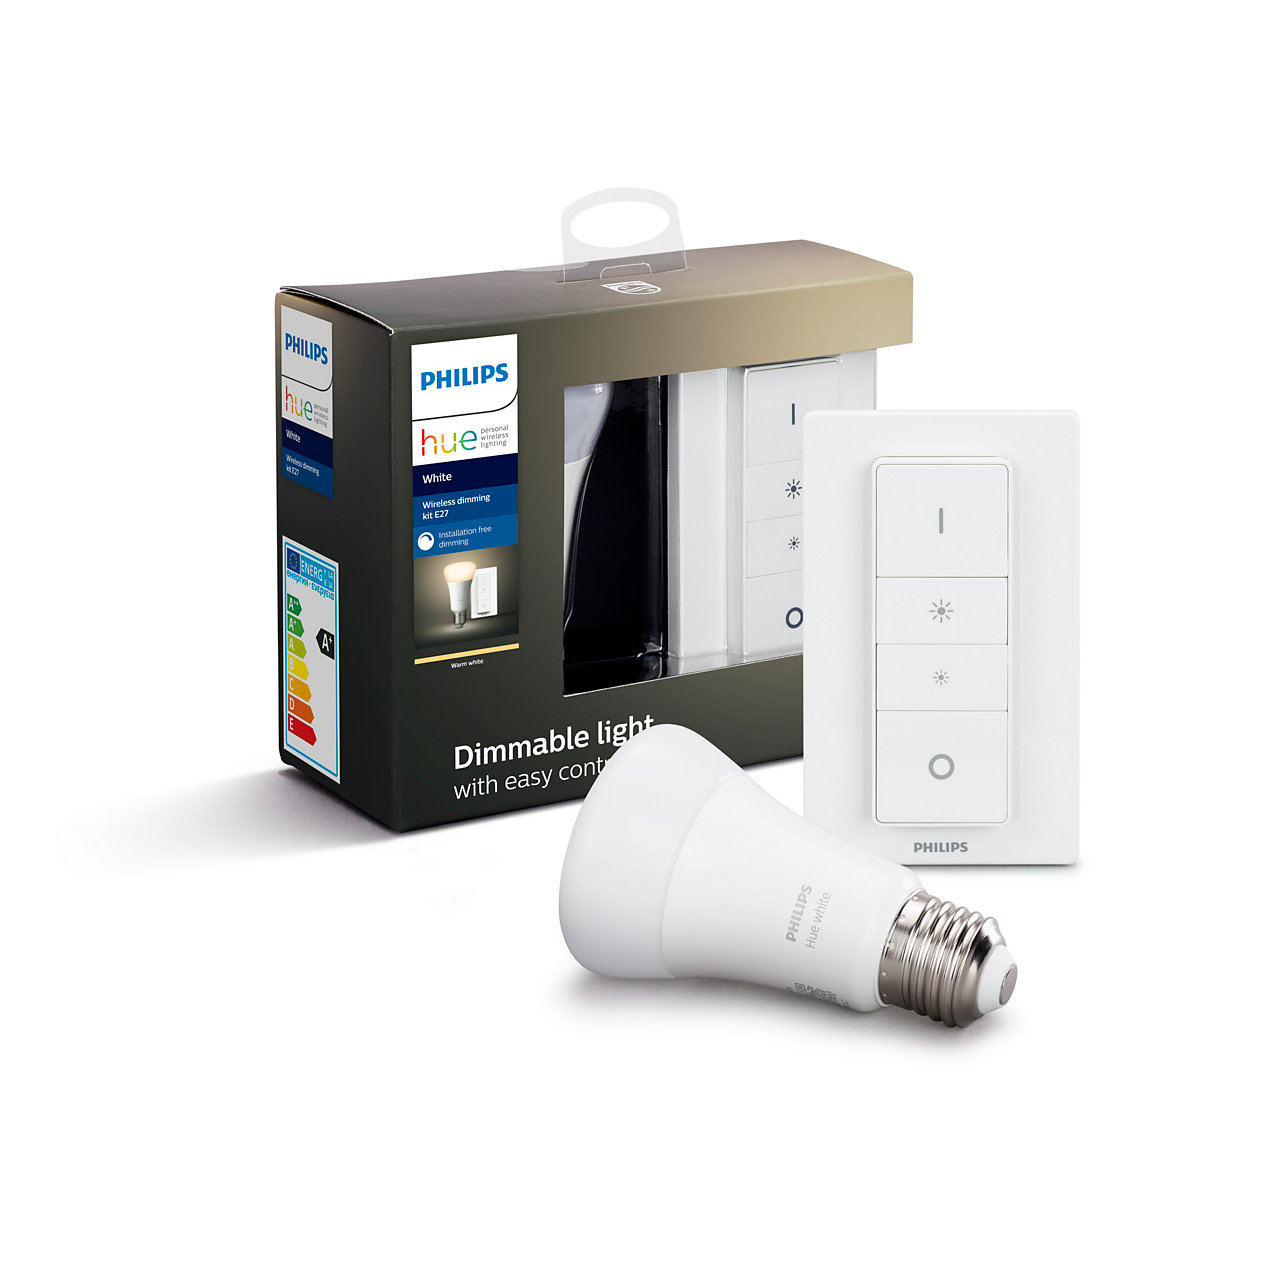 Philips Hue - E27 Wireless & Dimming Kit - White - Bluetooth